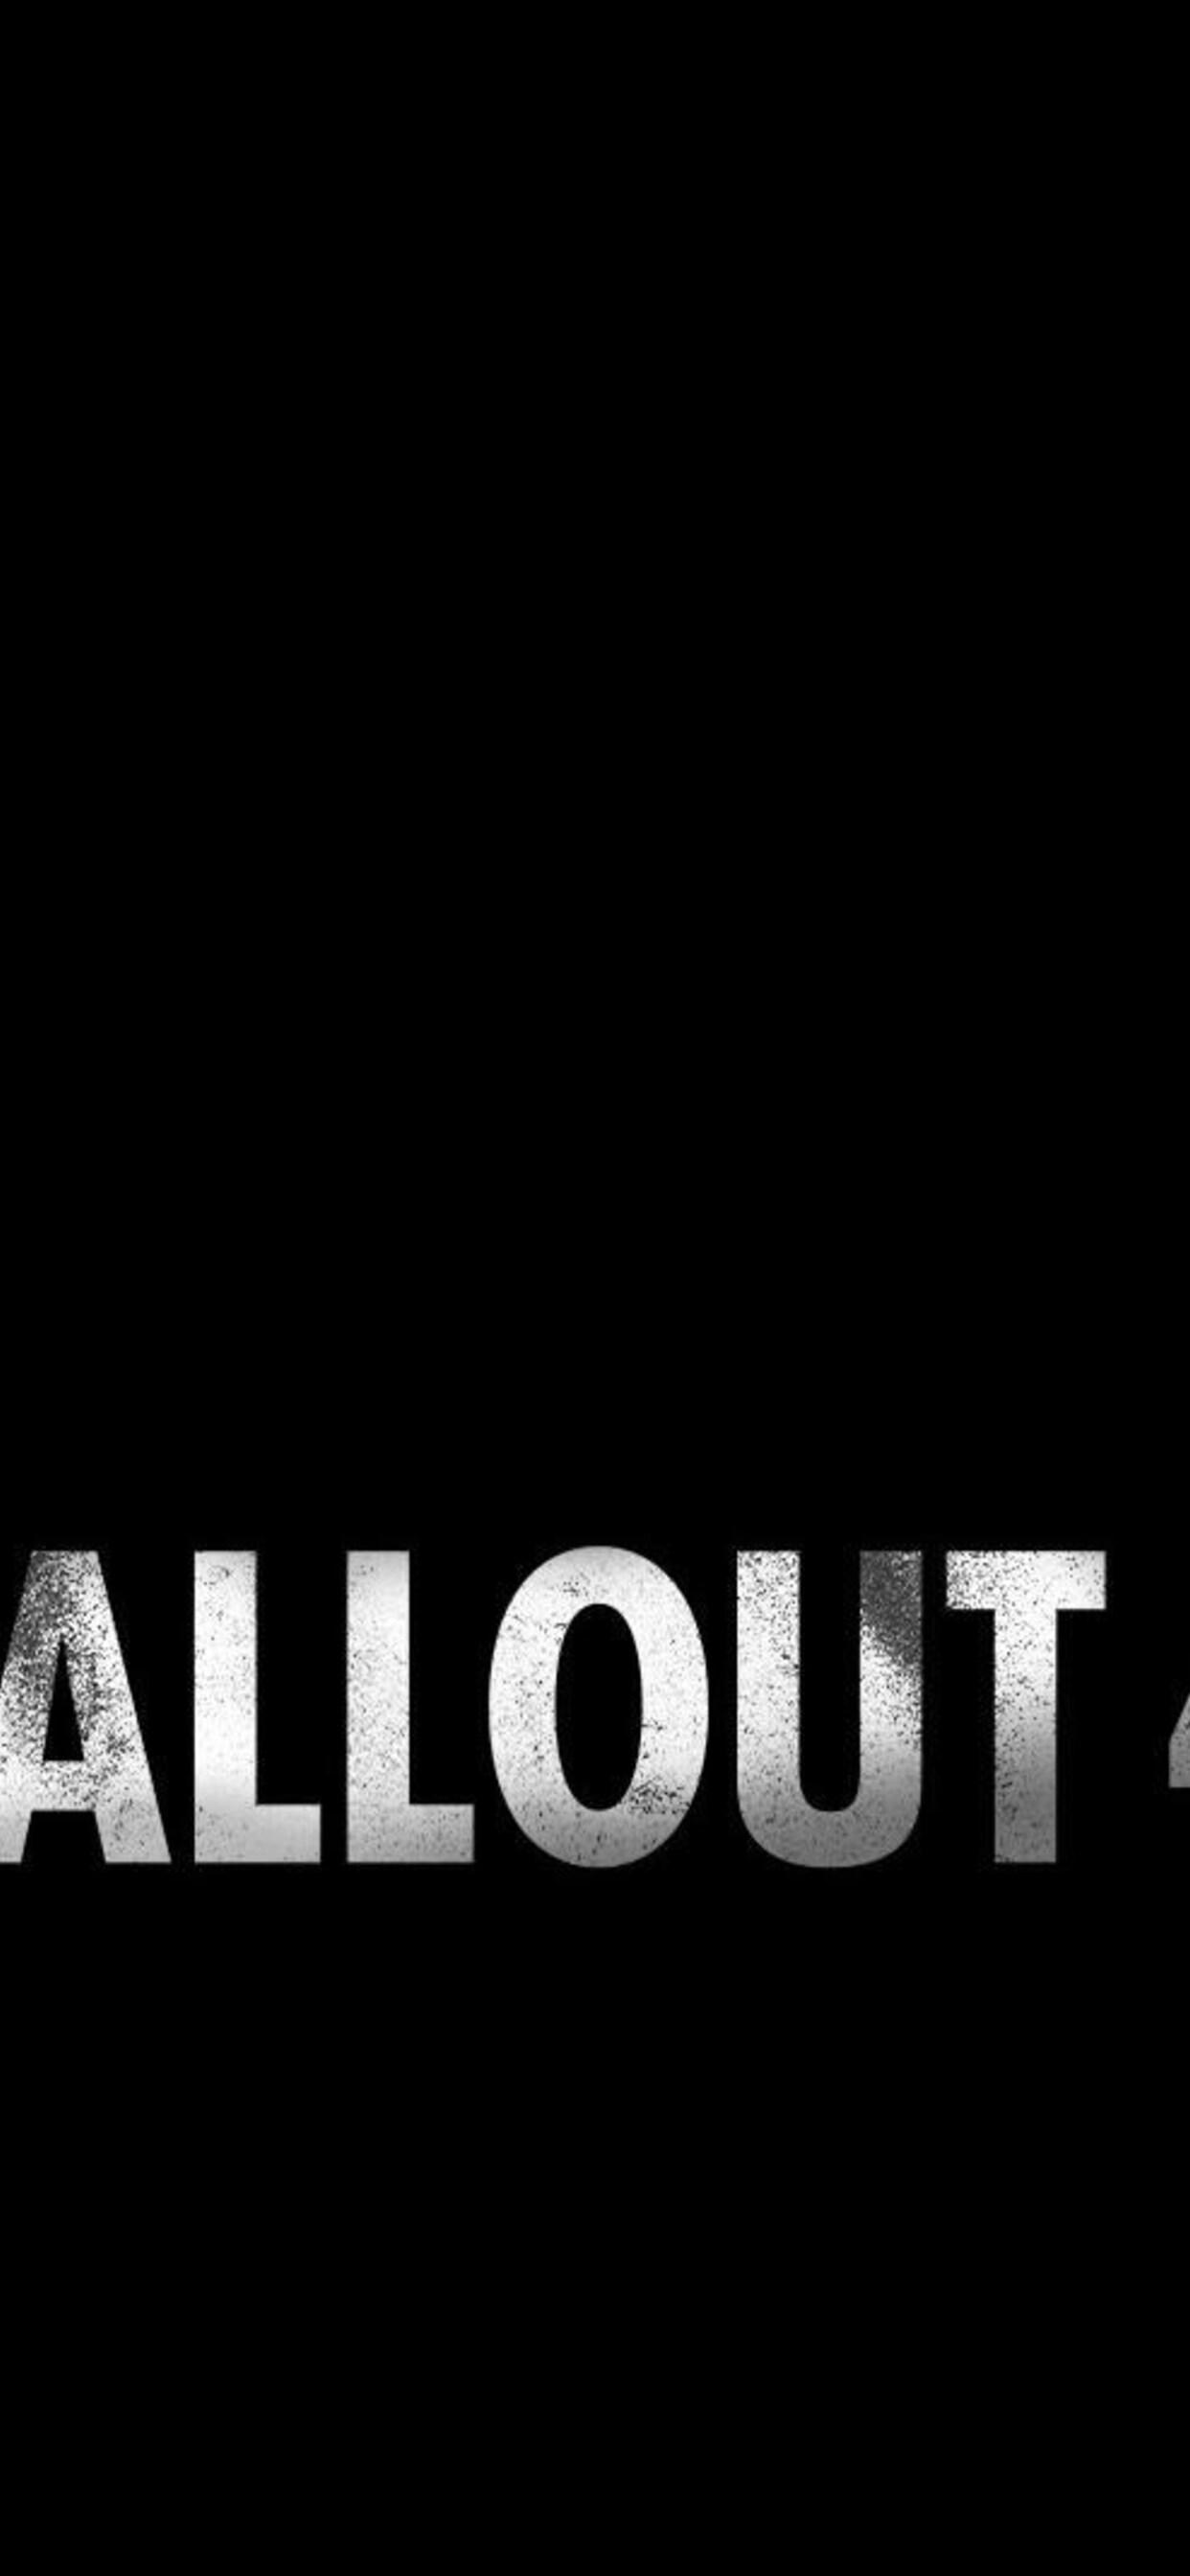 1242x2688 Fallout 4 Logo Iphone Xs Max Hd 4k Wallpapers